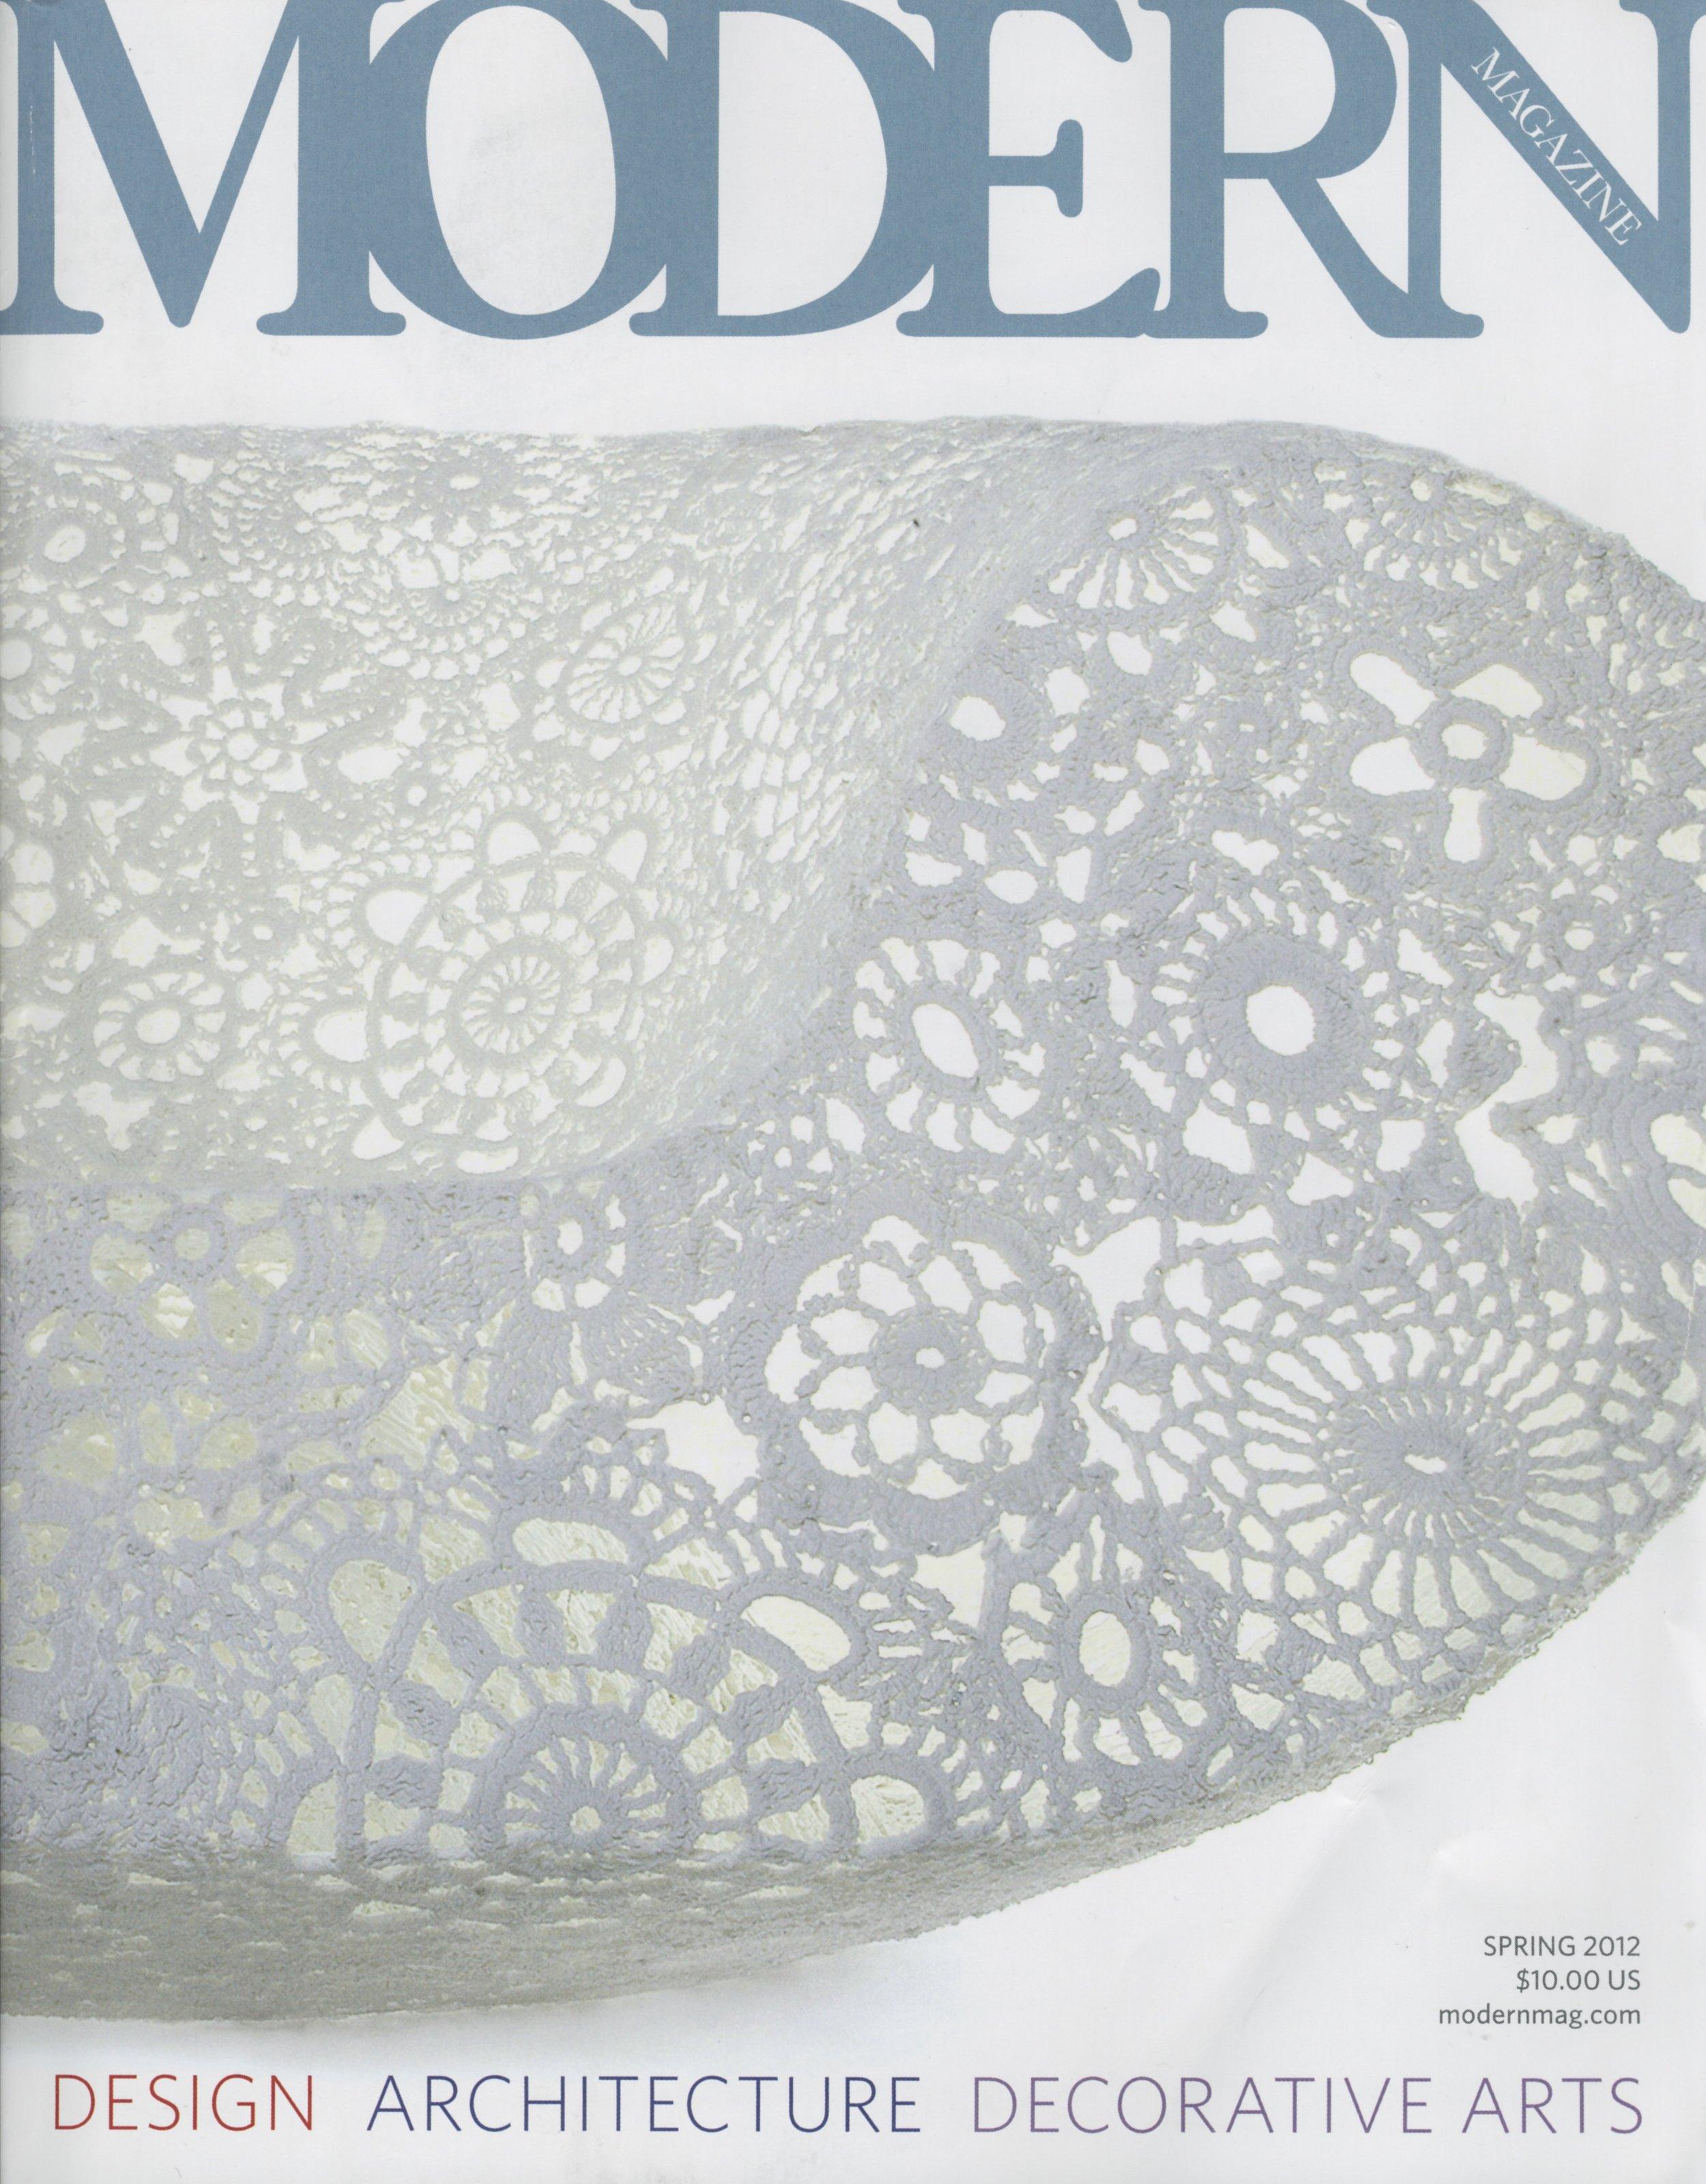 Love's Labor Lost, Modern Magazine, 2012